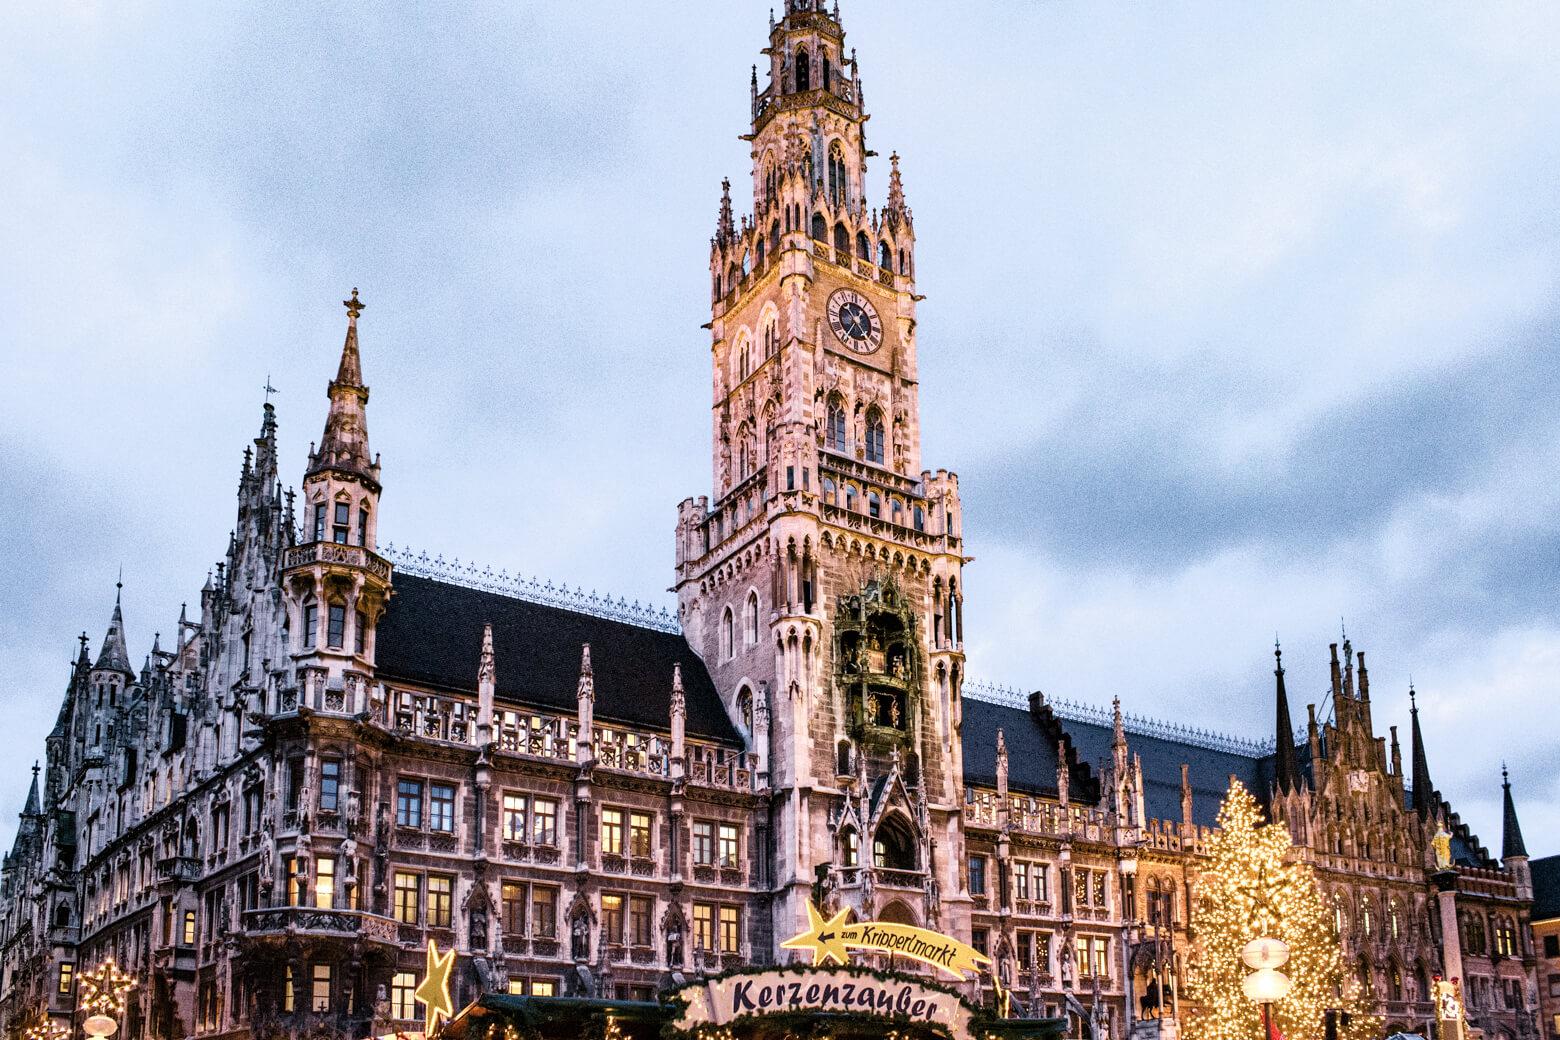 Christmas in Munich, Germany